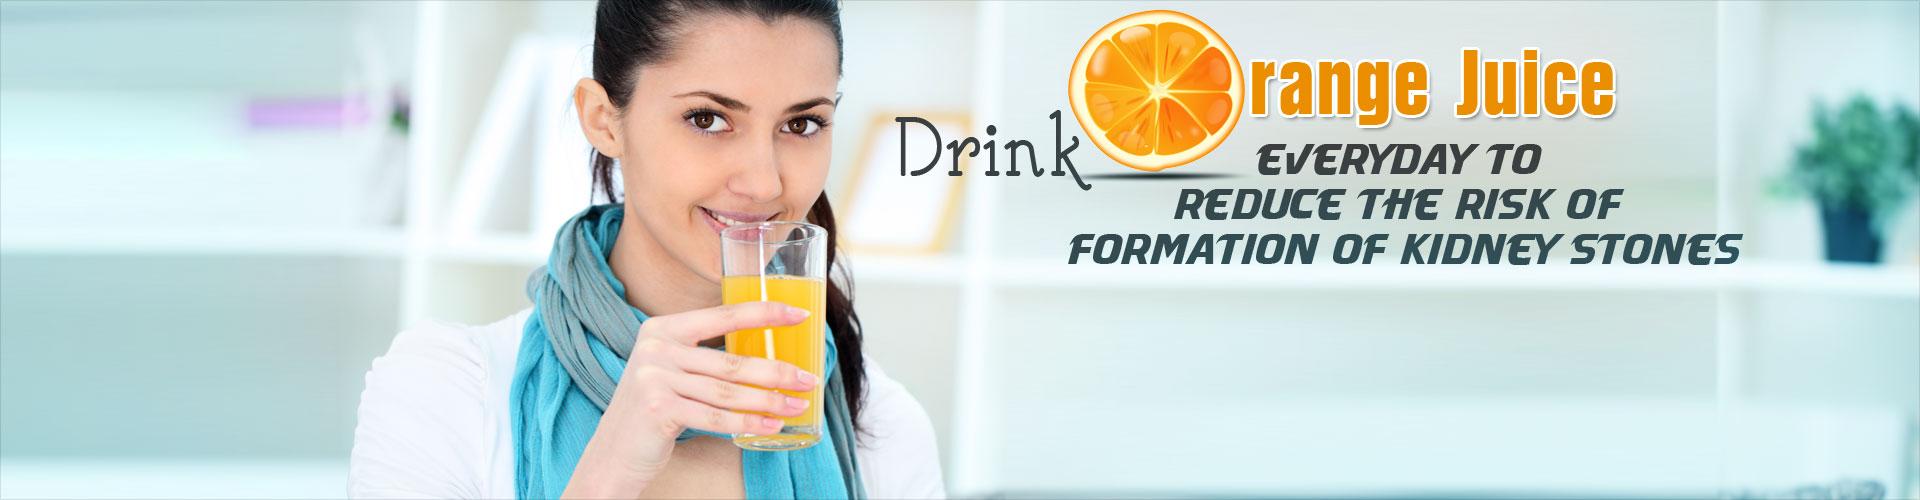 Drink Orange Juice Everyday to Reduce Risk of Kidney Stones